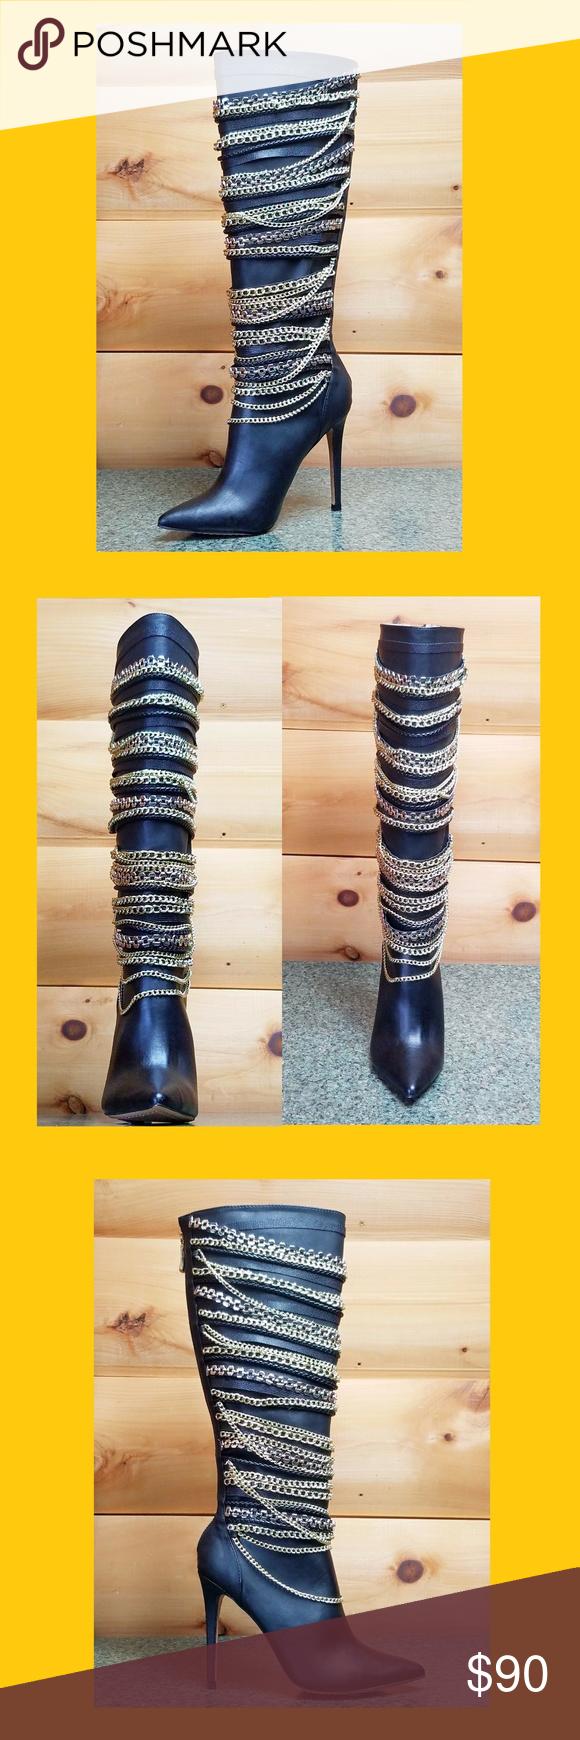 Beverly Black Velvet Floral Gold Embroidered Silver Sequined OTK High Heel Boots